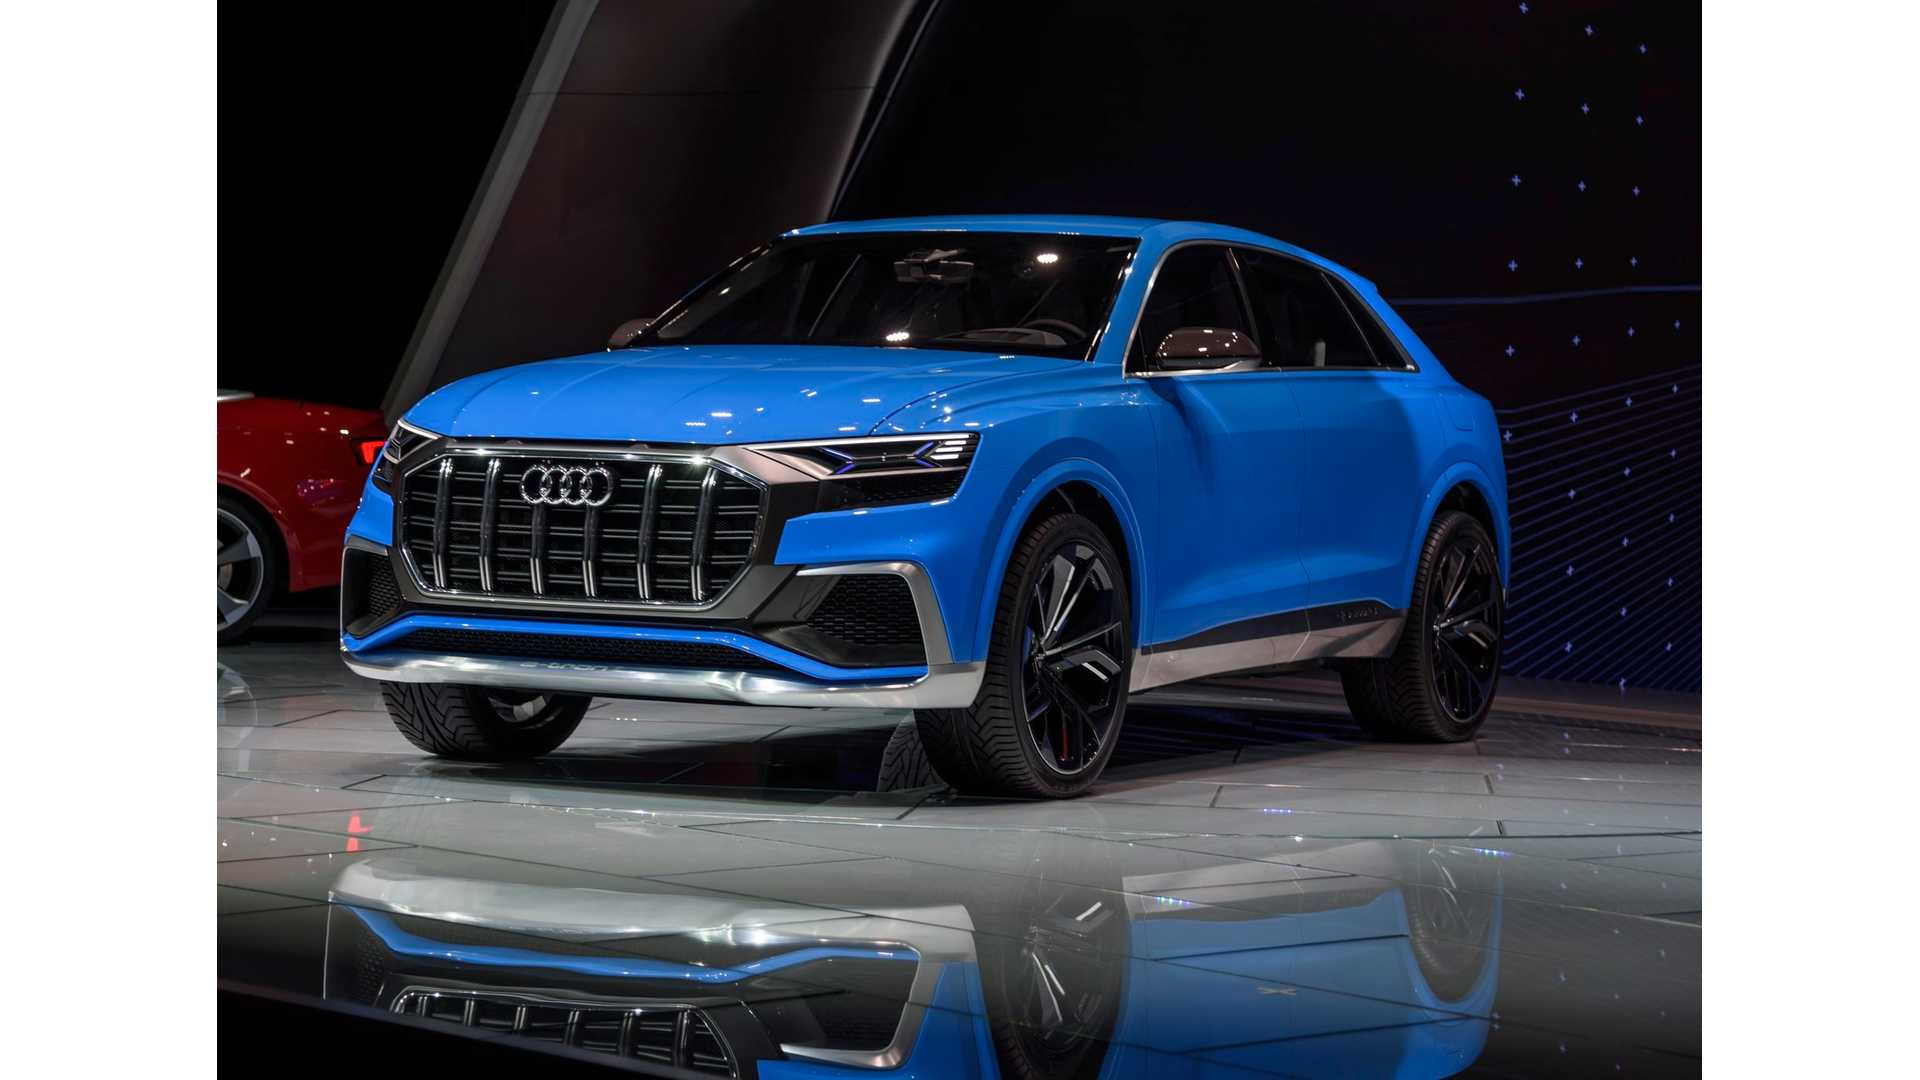 Audi Q8 Suv Plug In Hybrid Debuts With 37 Miles Range Arrives 2018 Videos